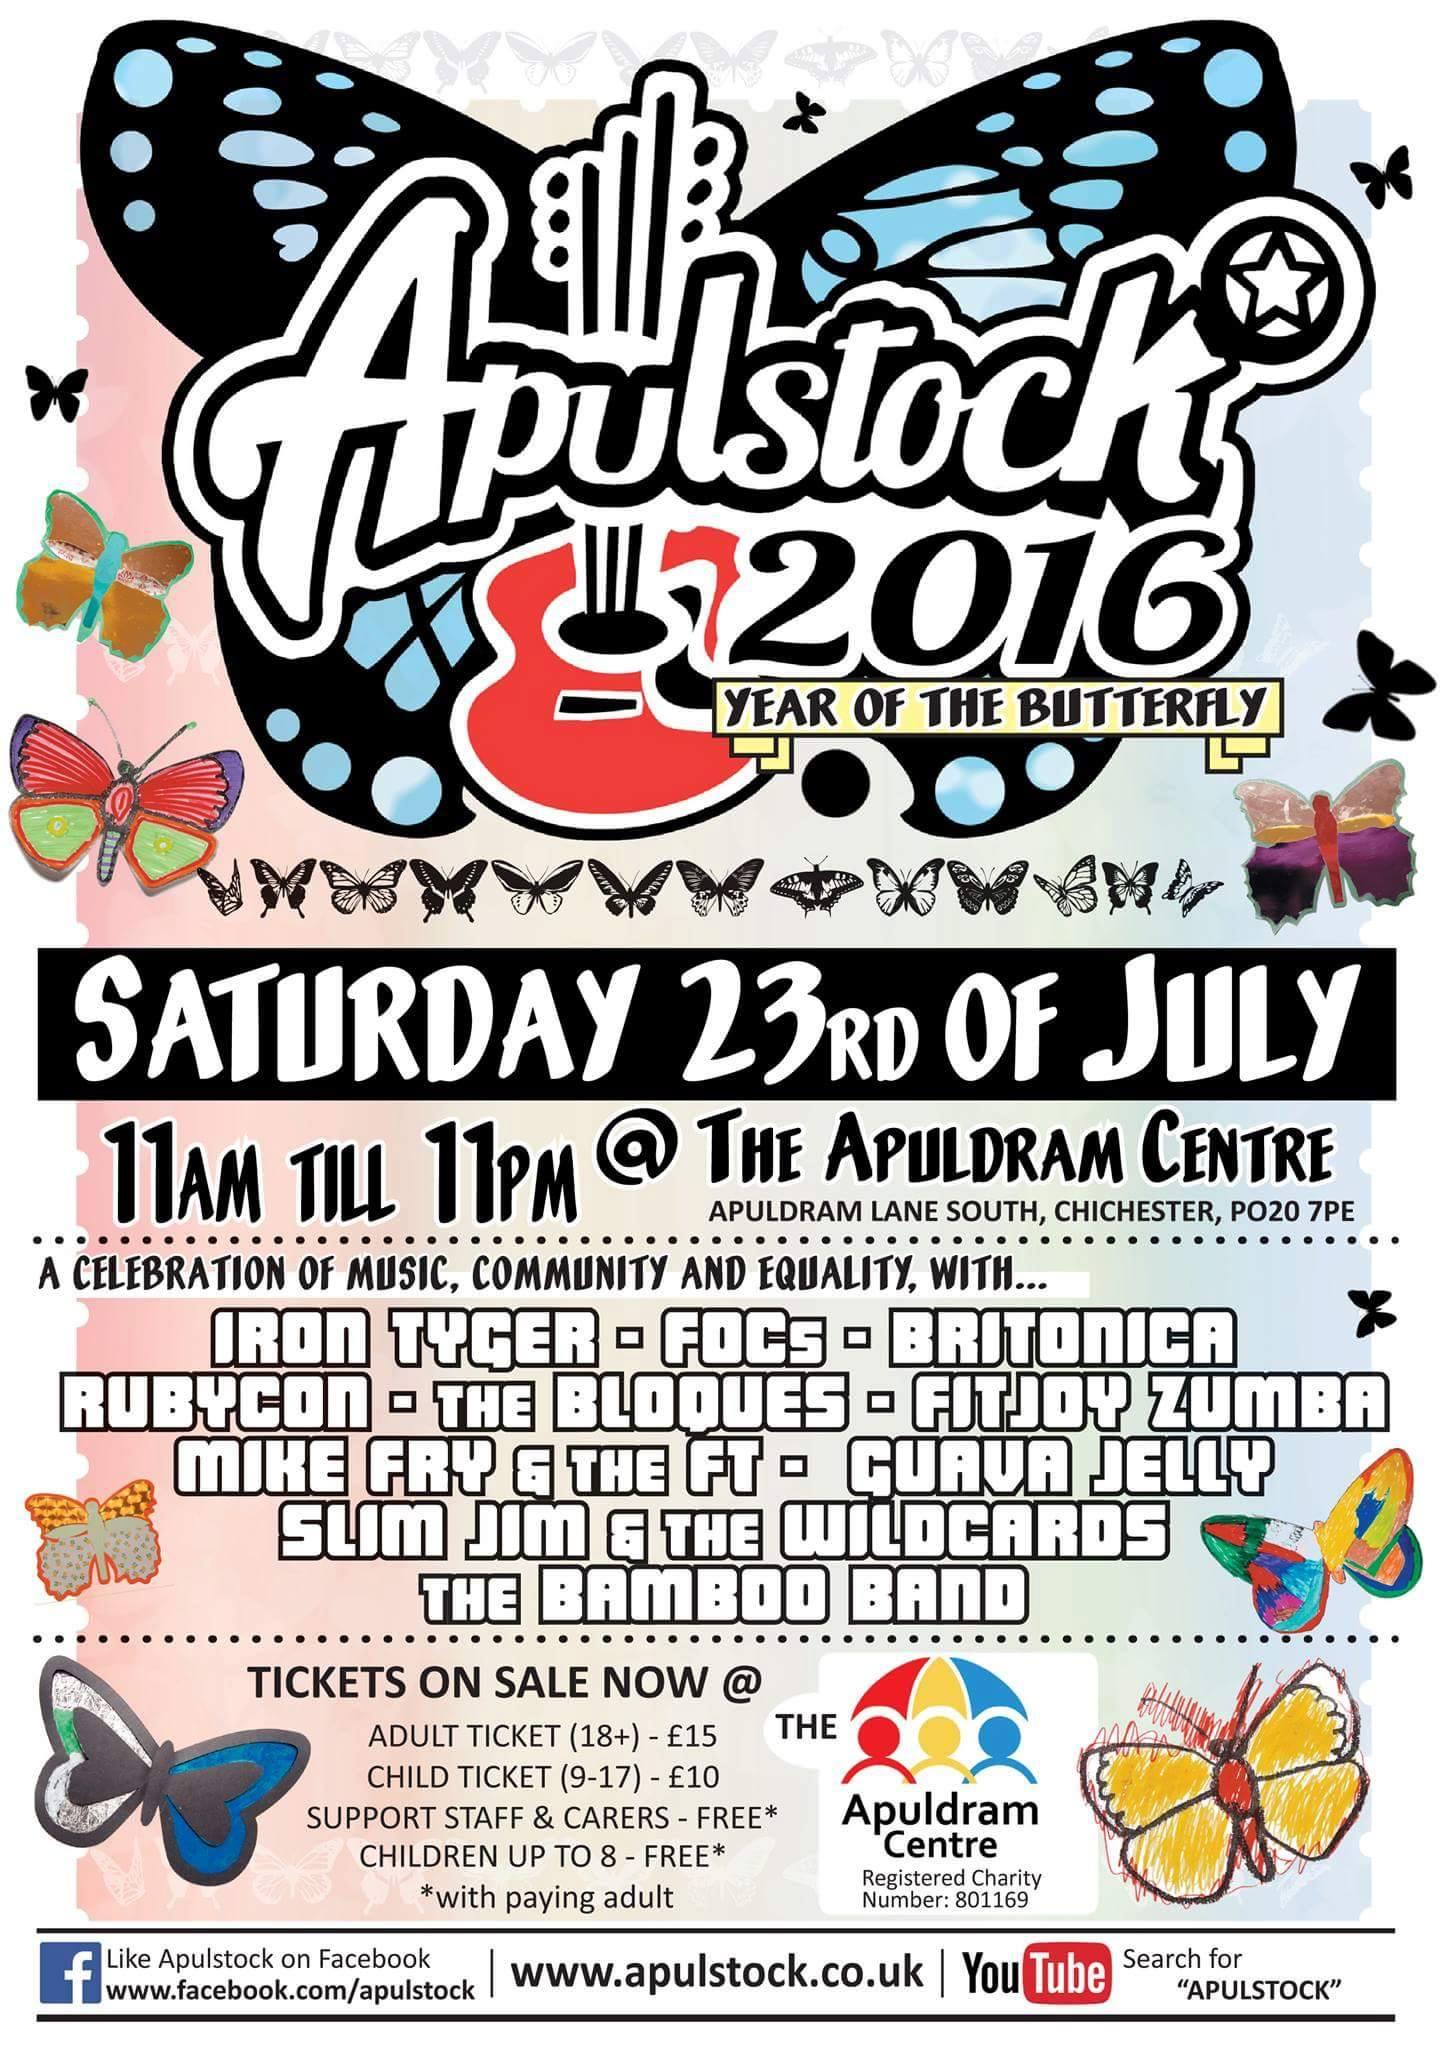 Apulstock